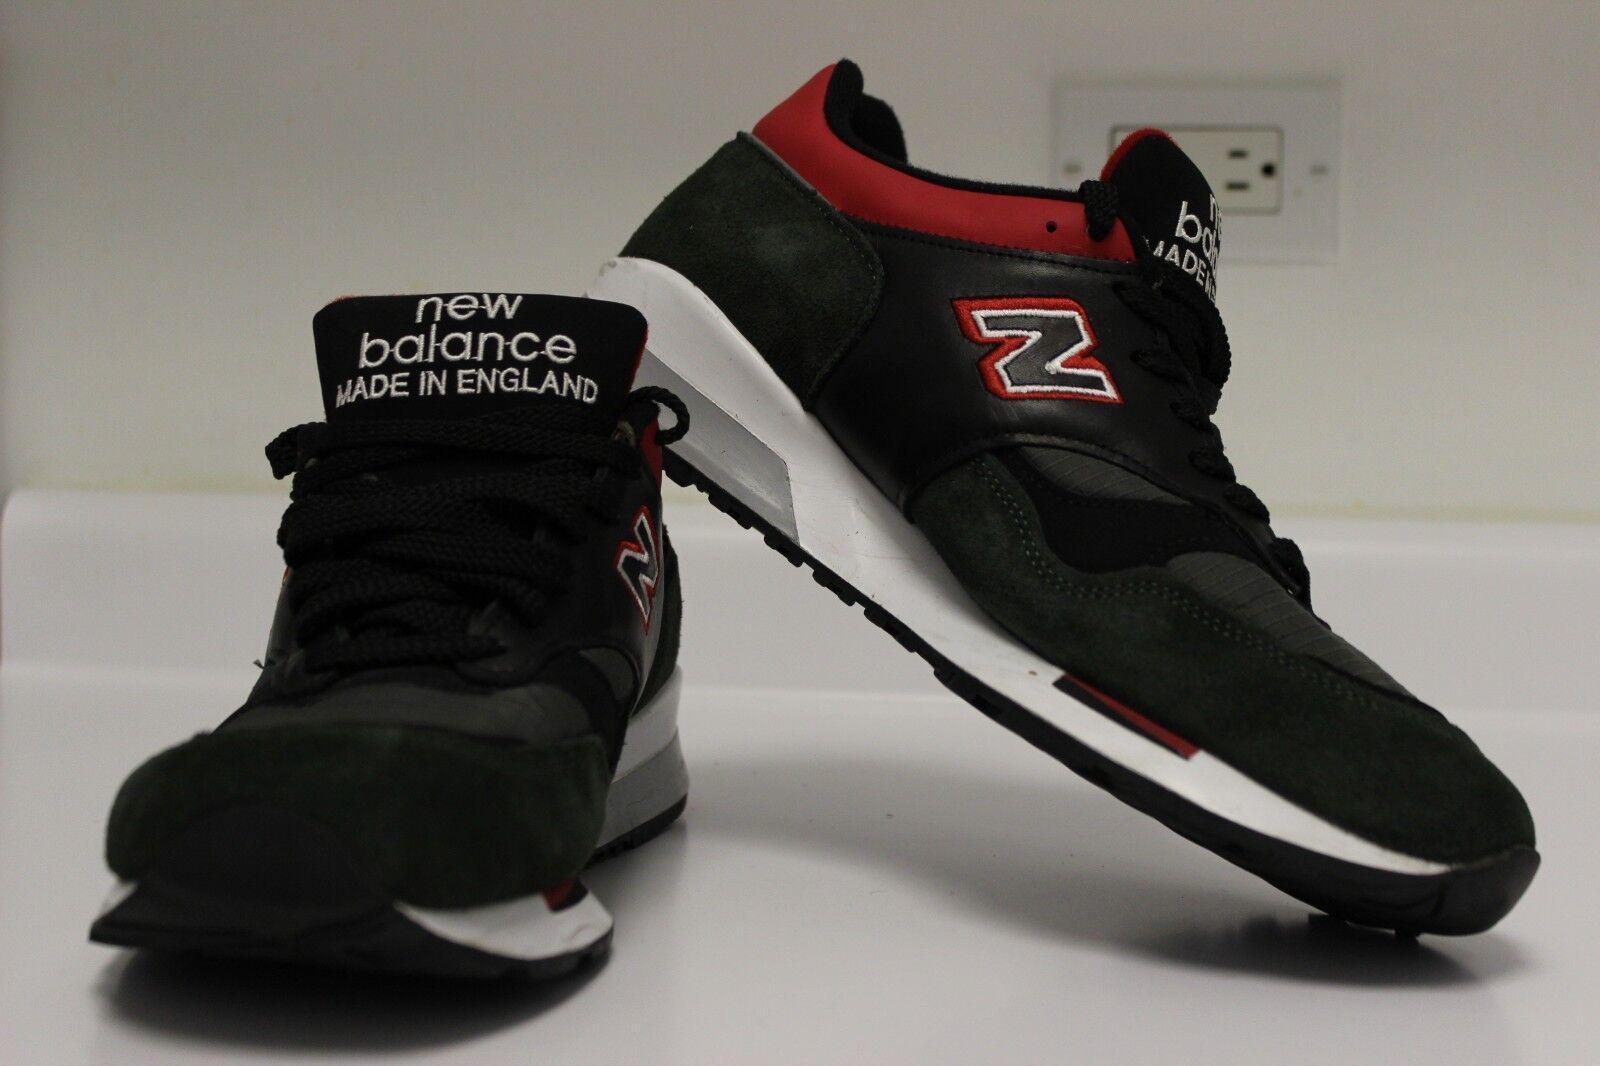 NEW BALANCE M1500RGR M1500RGR M1500RGR MADE IN ENGLAND MENS nero verde rosso scarpe da ginnastica 10.5 2d94d5